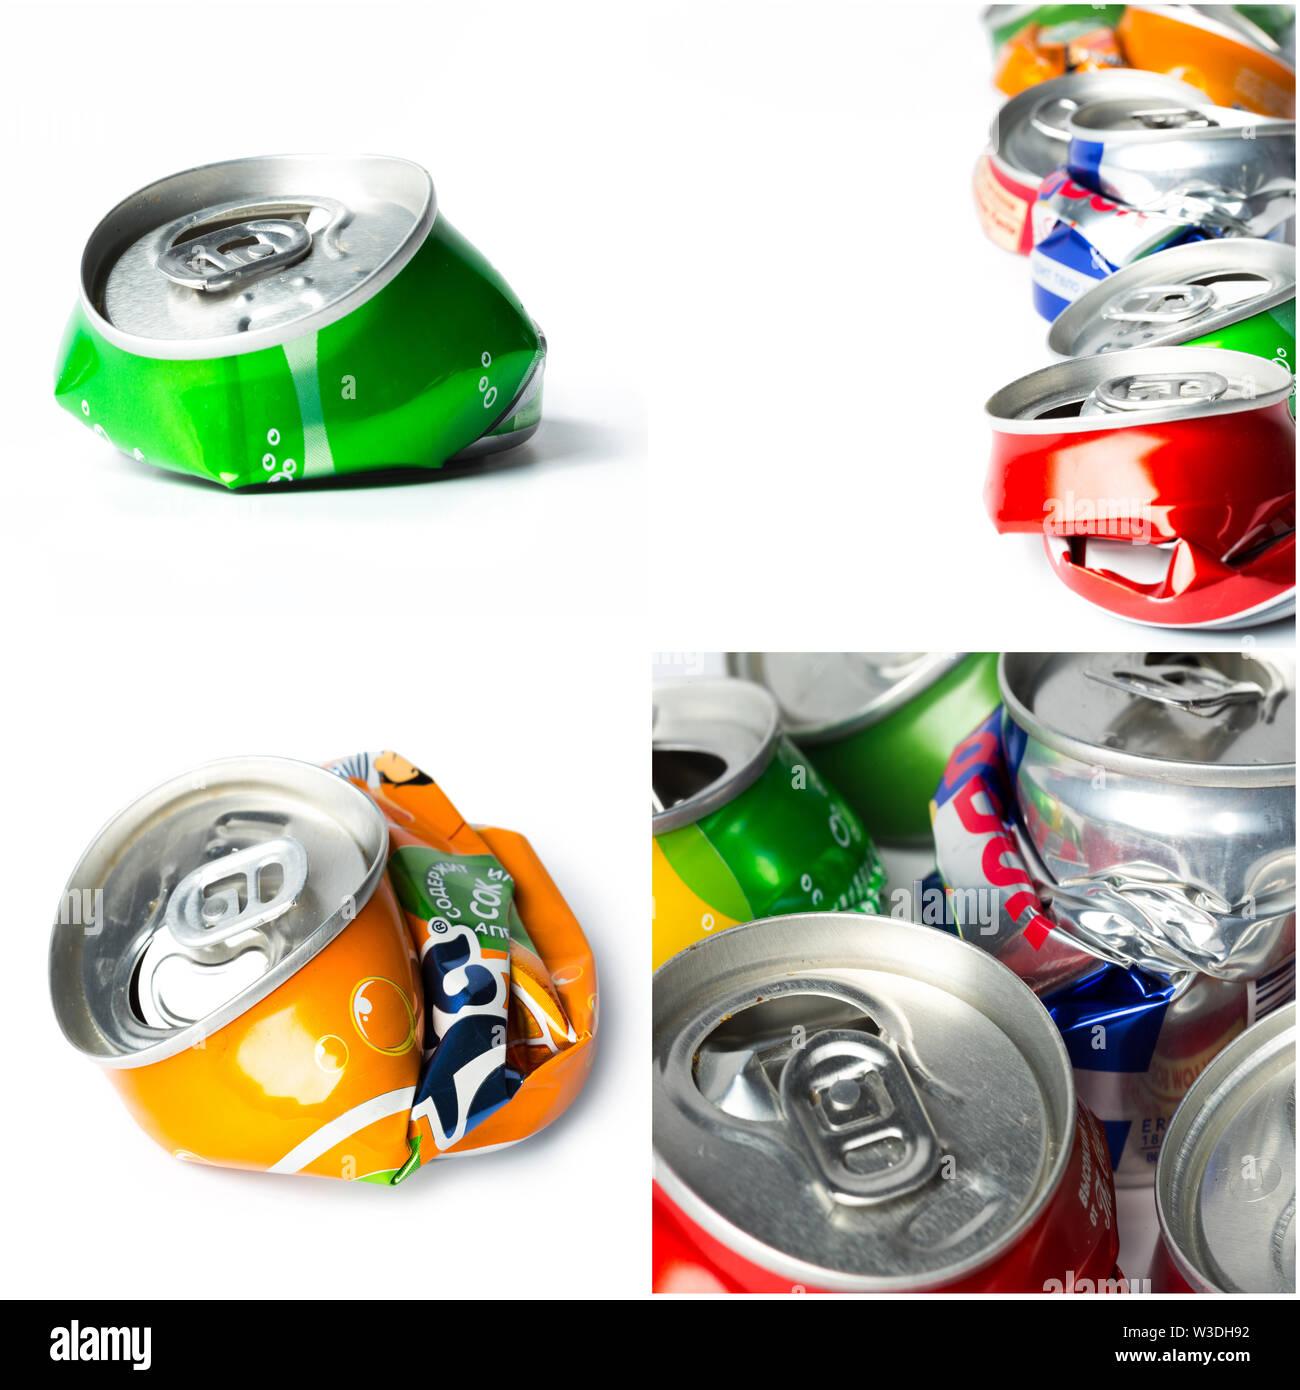 Aluminum cans isolated on white - Stock Image